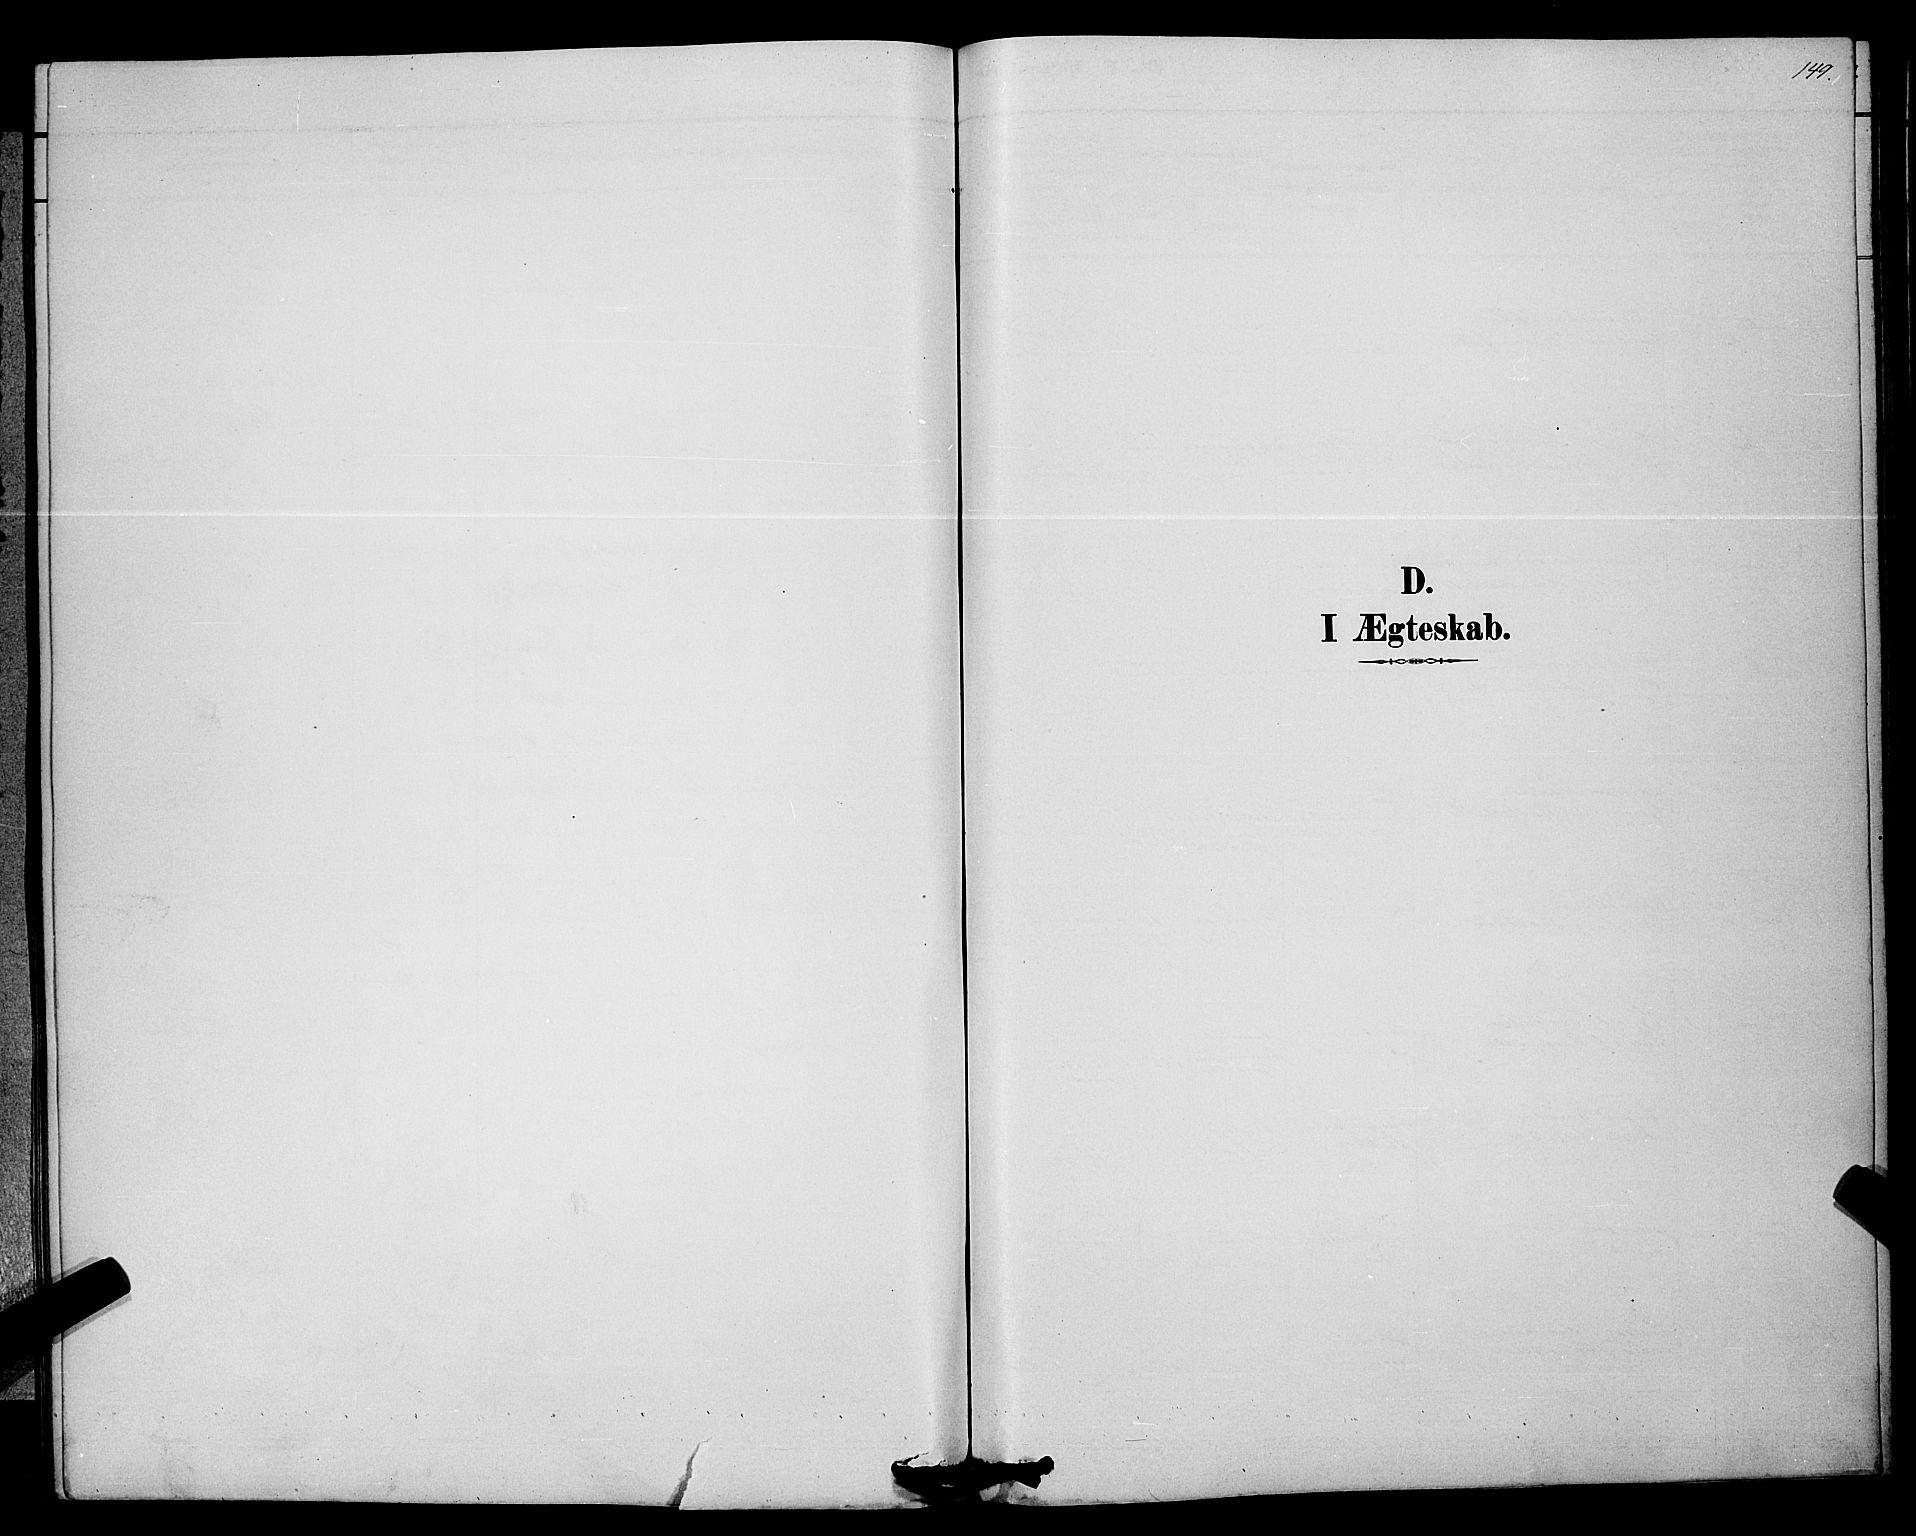 SAKO, Bø kirkebøker, G/Ga/L0005: Klokkerbok nr. 5, 1883-1897, s. 149